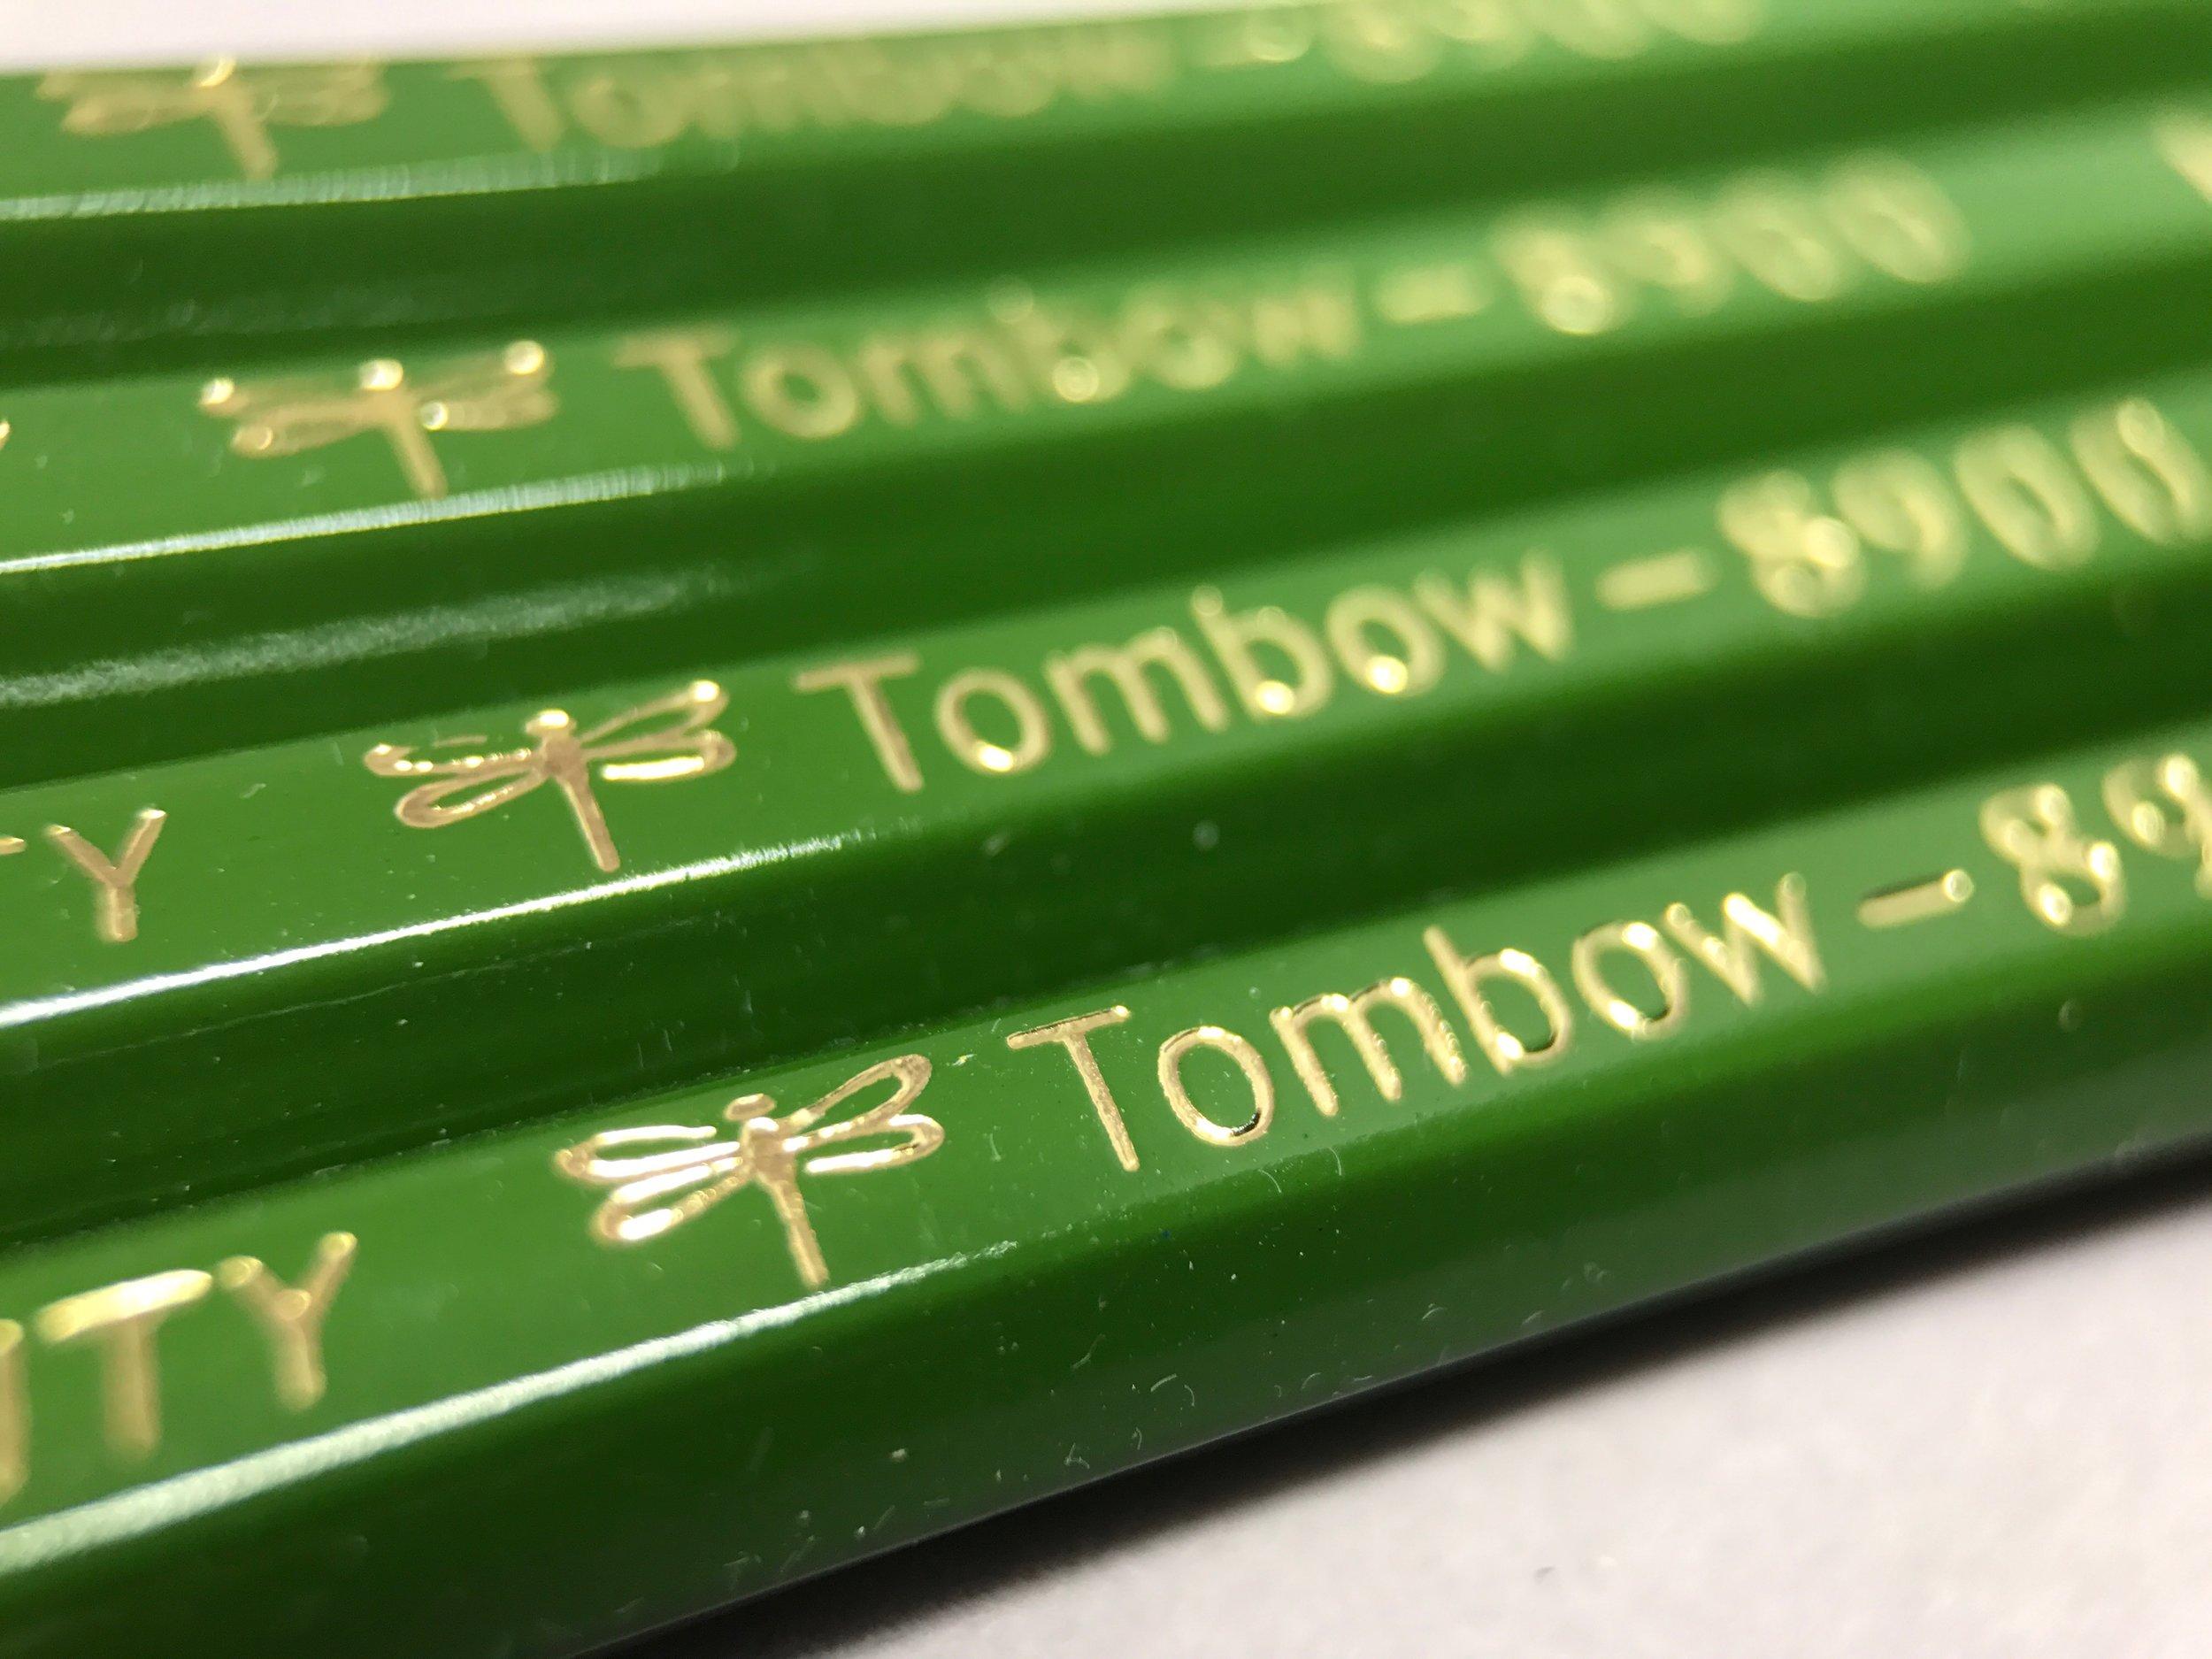 tombow-8900-pencil-8.jpg